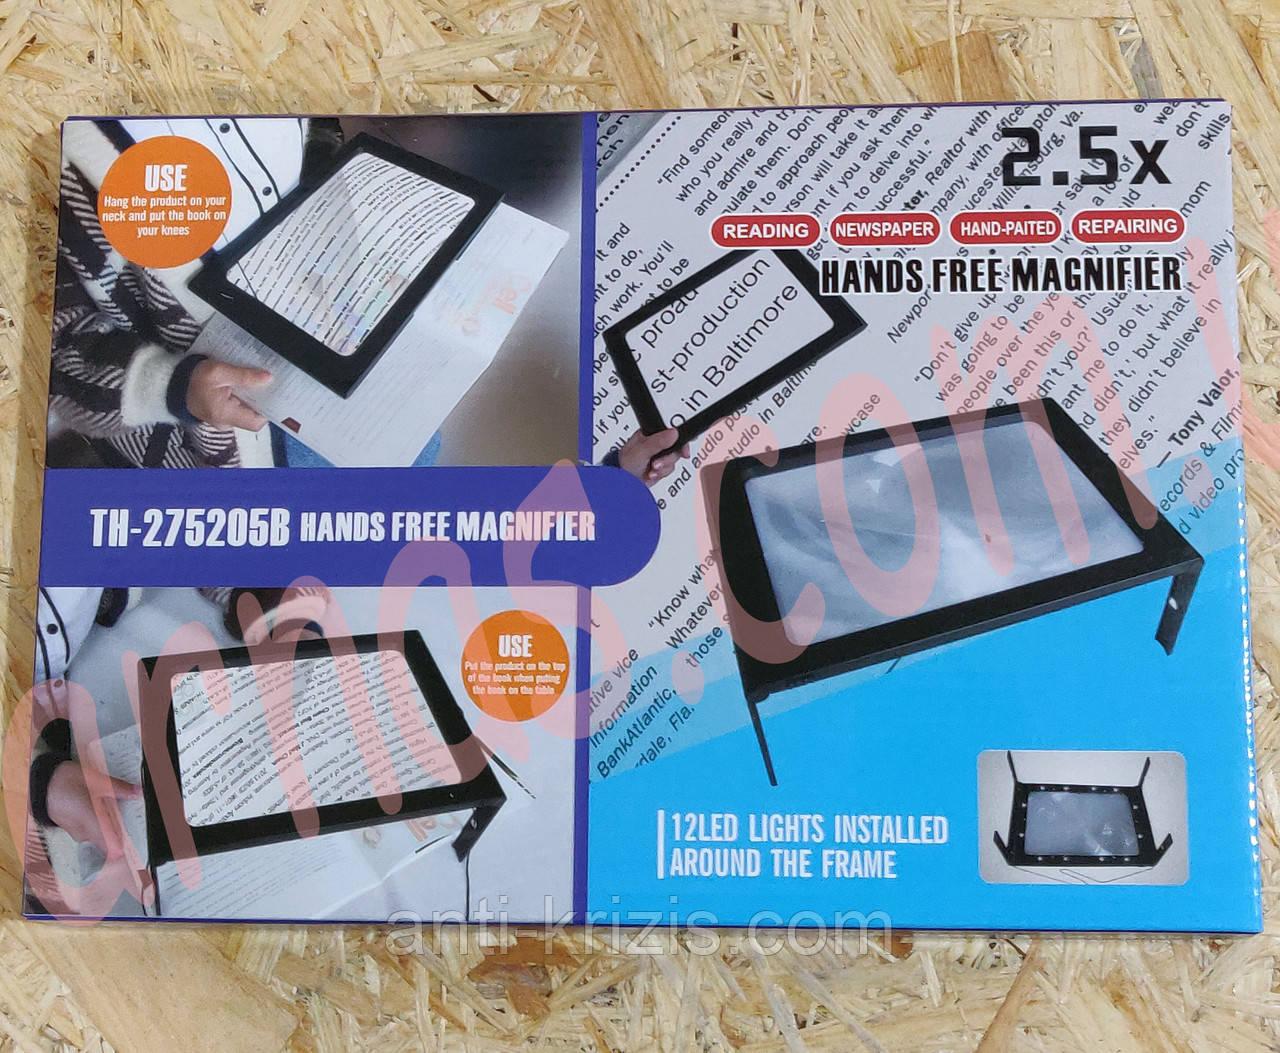 Увеличительная рамка TH-275205B Hands free magnifier